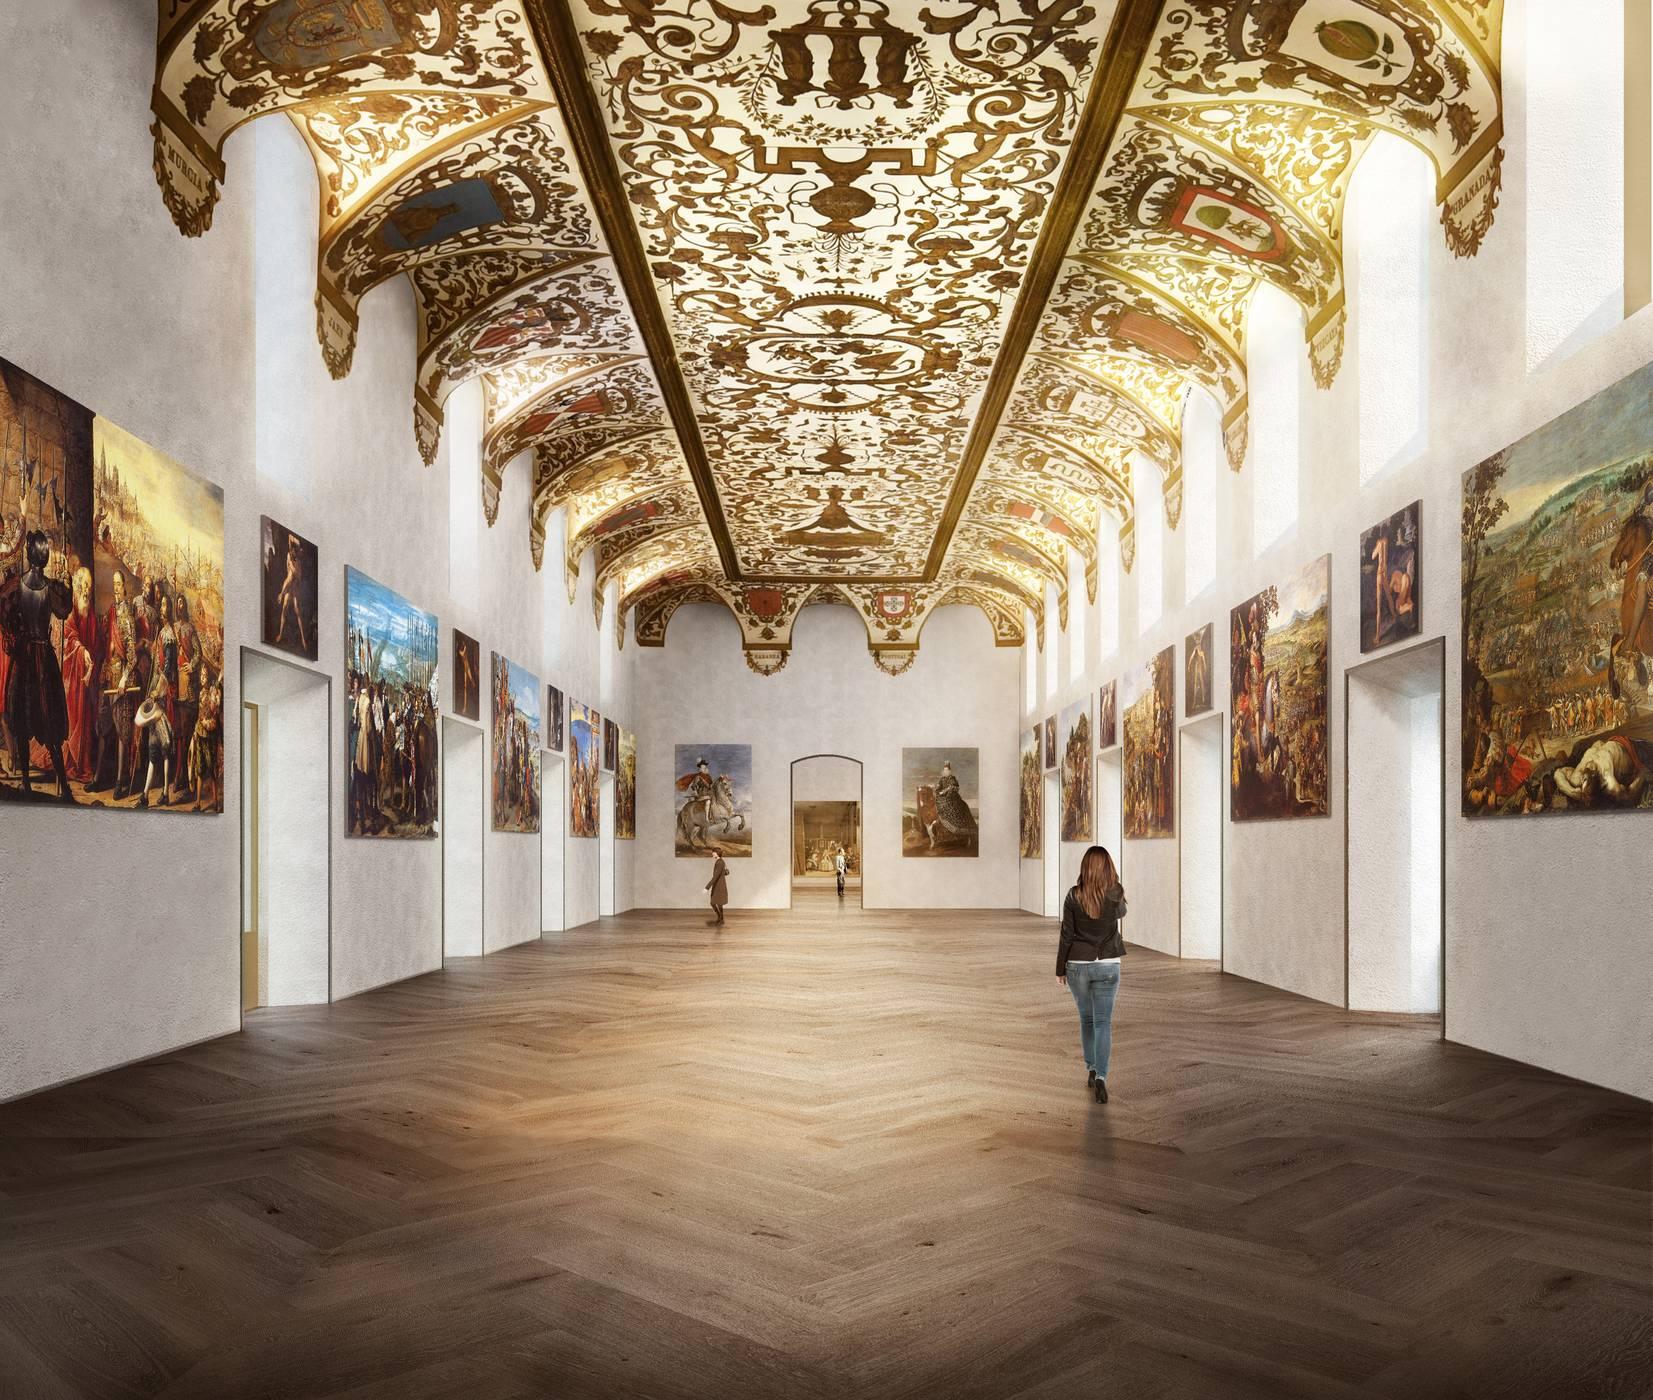 Museo De.Museo Nacional Del Prado Gluckman Tang